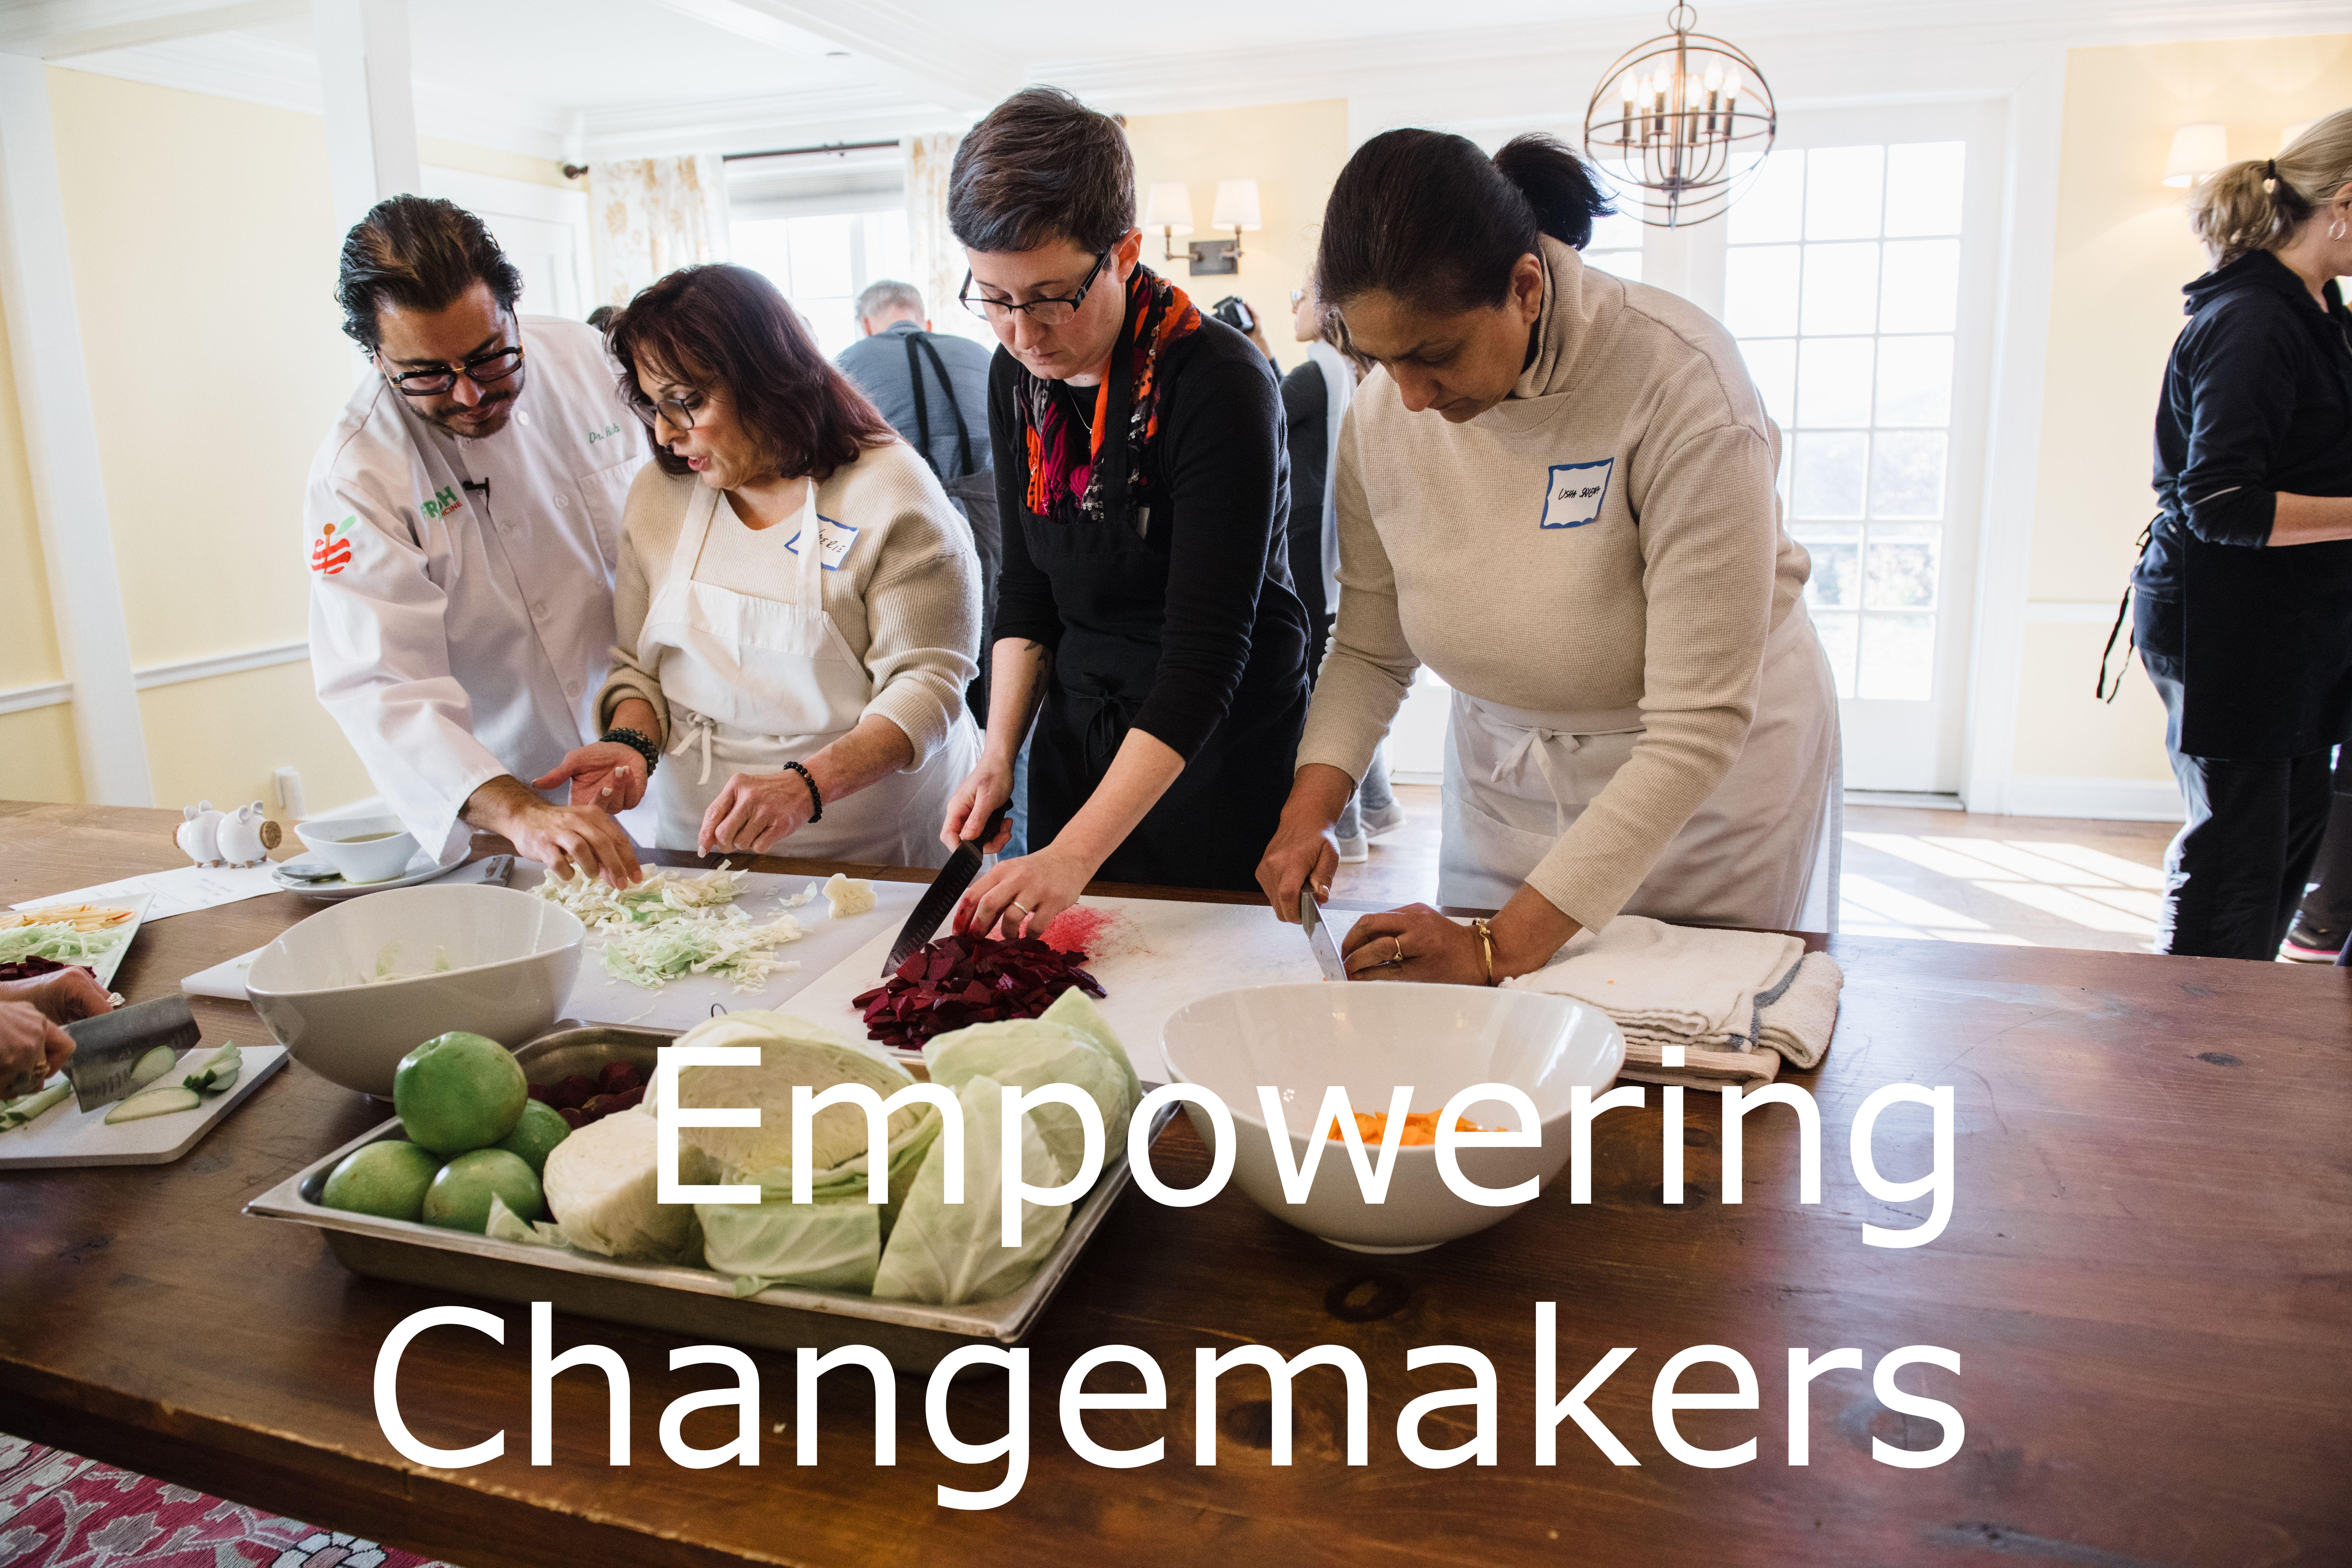 Empowering Changemakers